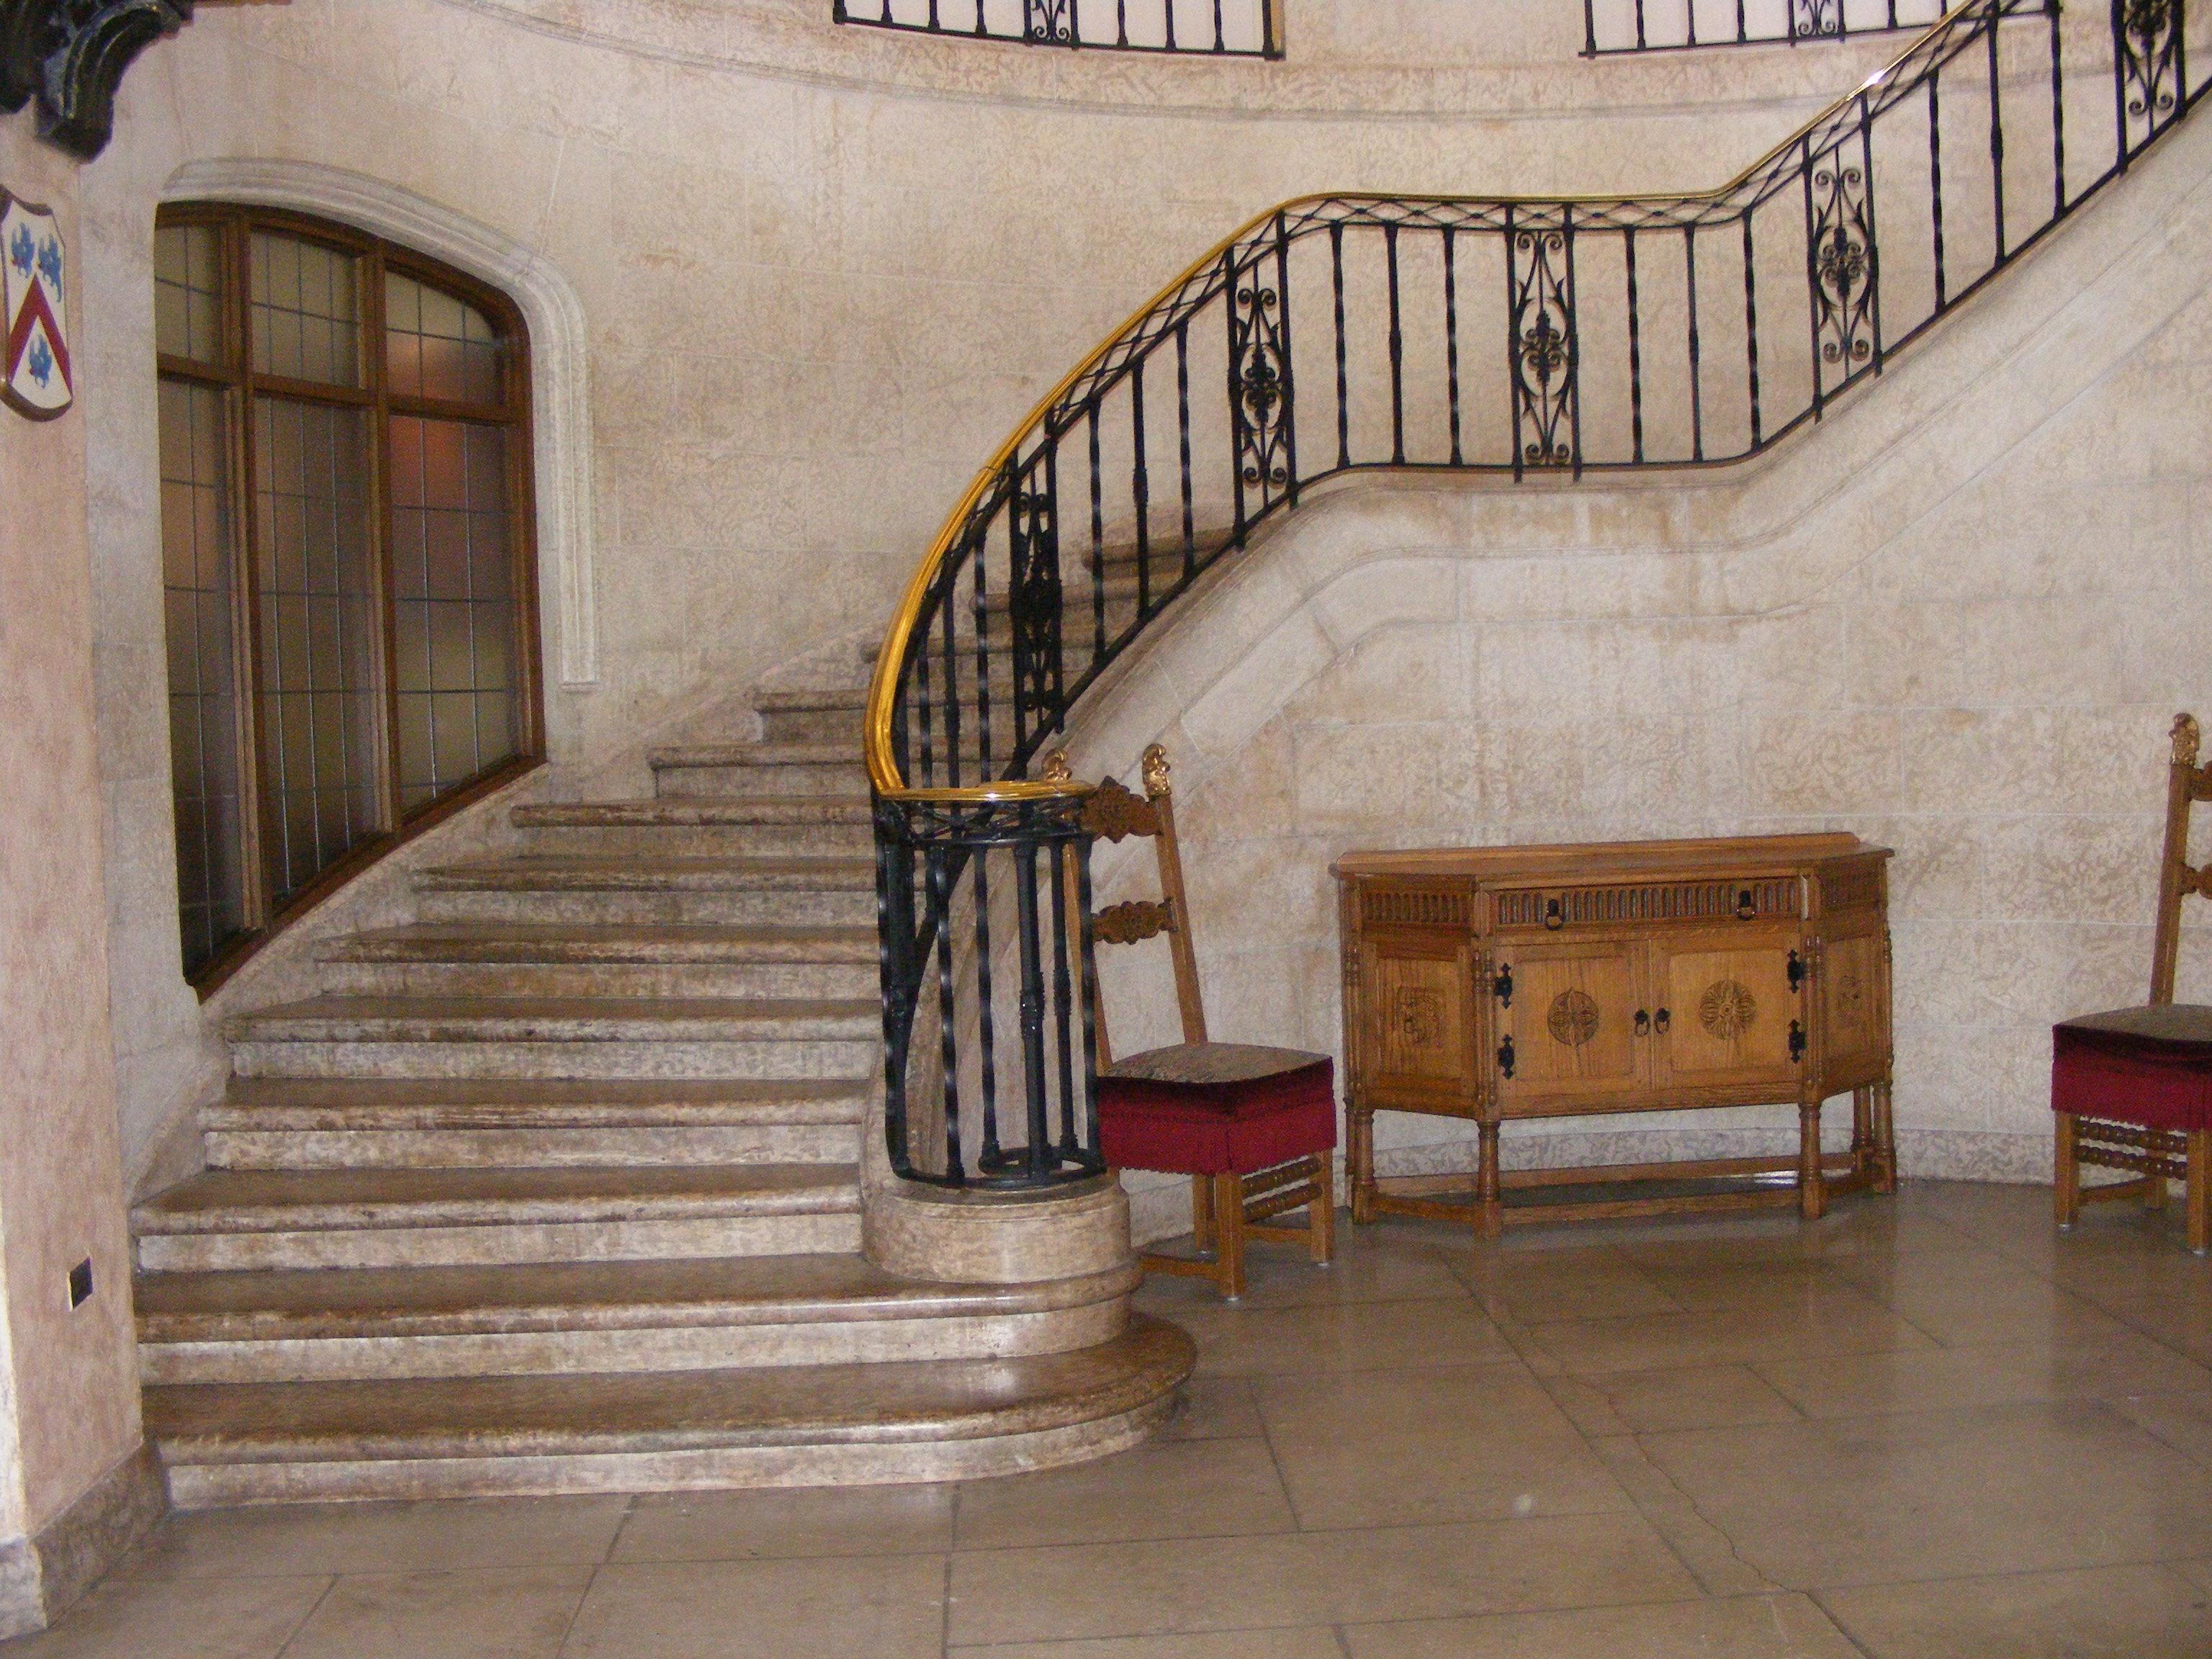 File:Banff Springs staircase.JPG